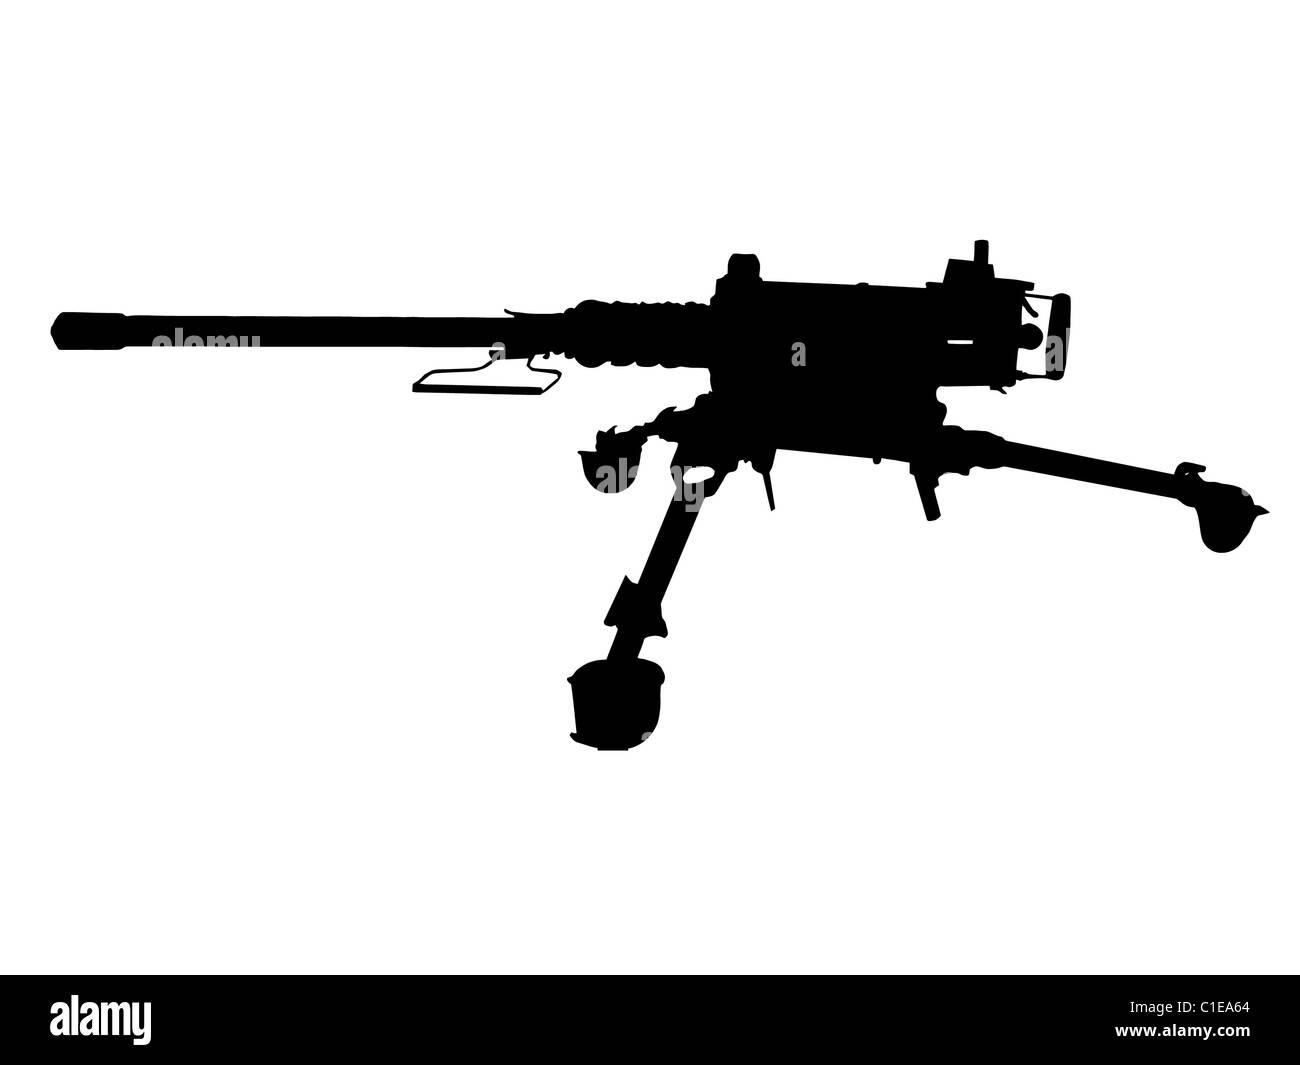 12 7mm Browning Heavy Machine Gun Stock Photos & 12 7mm Browning